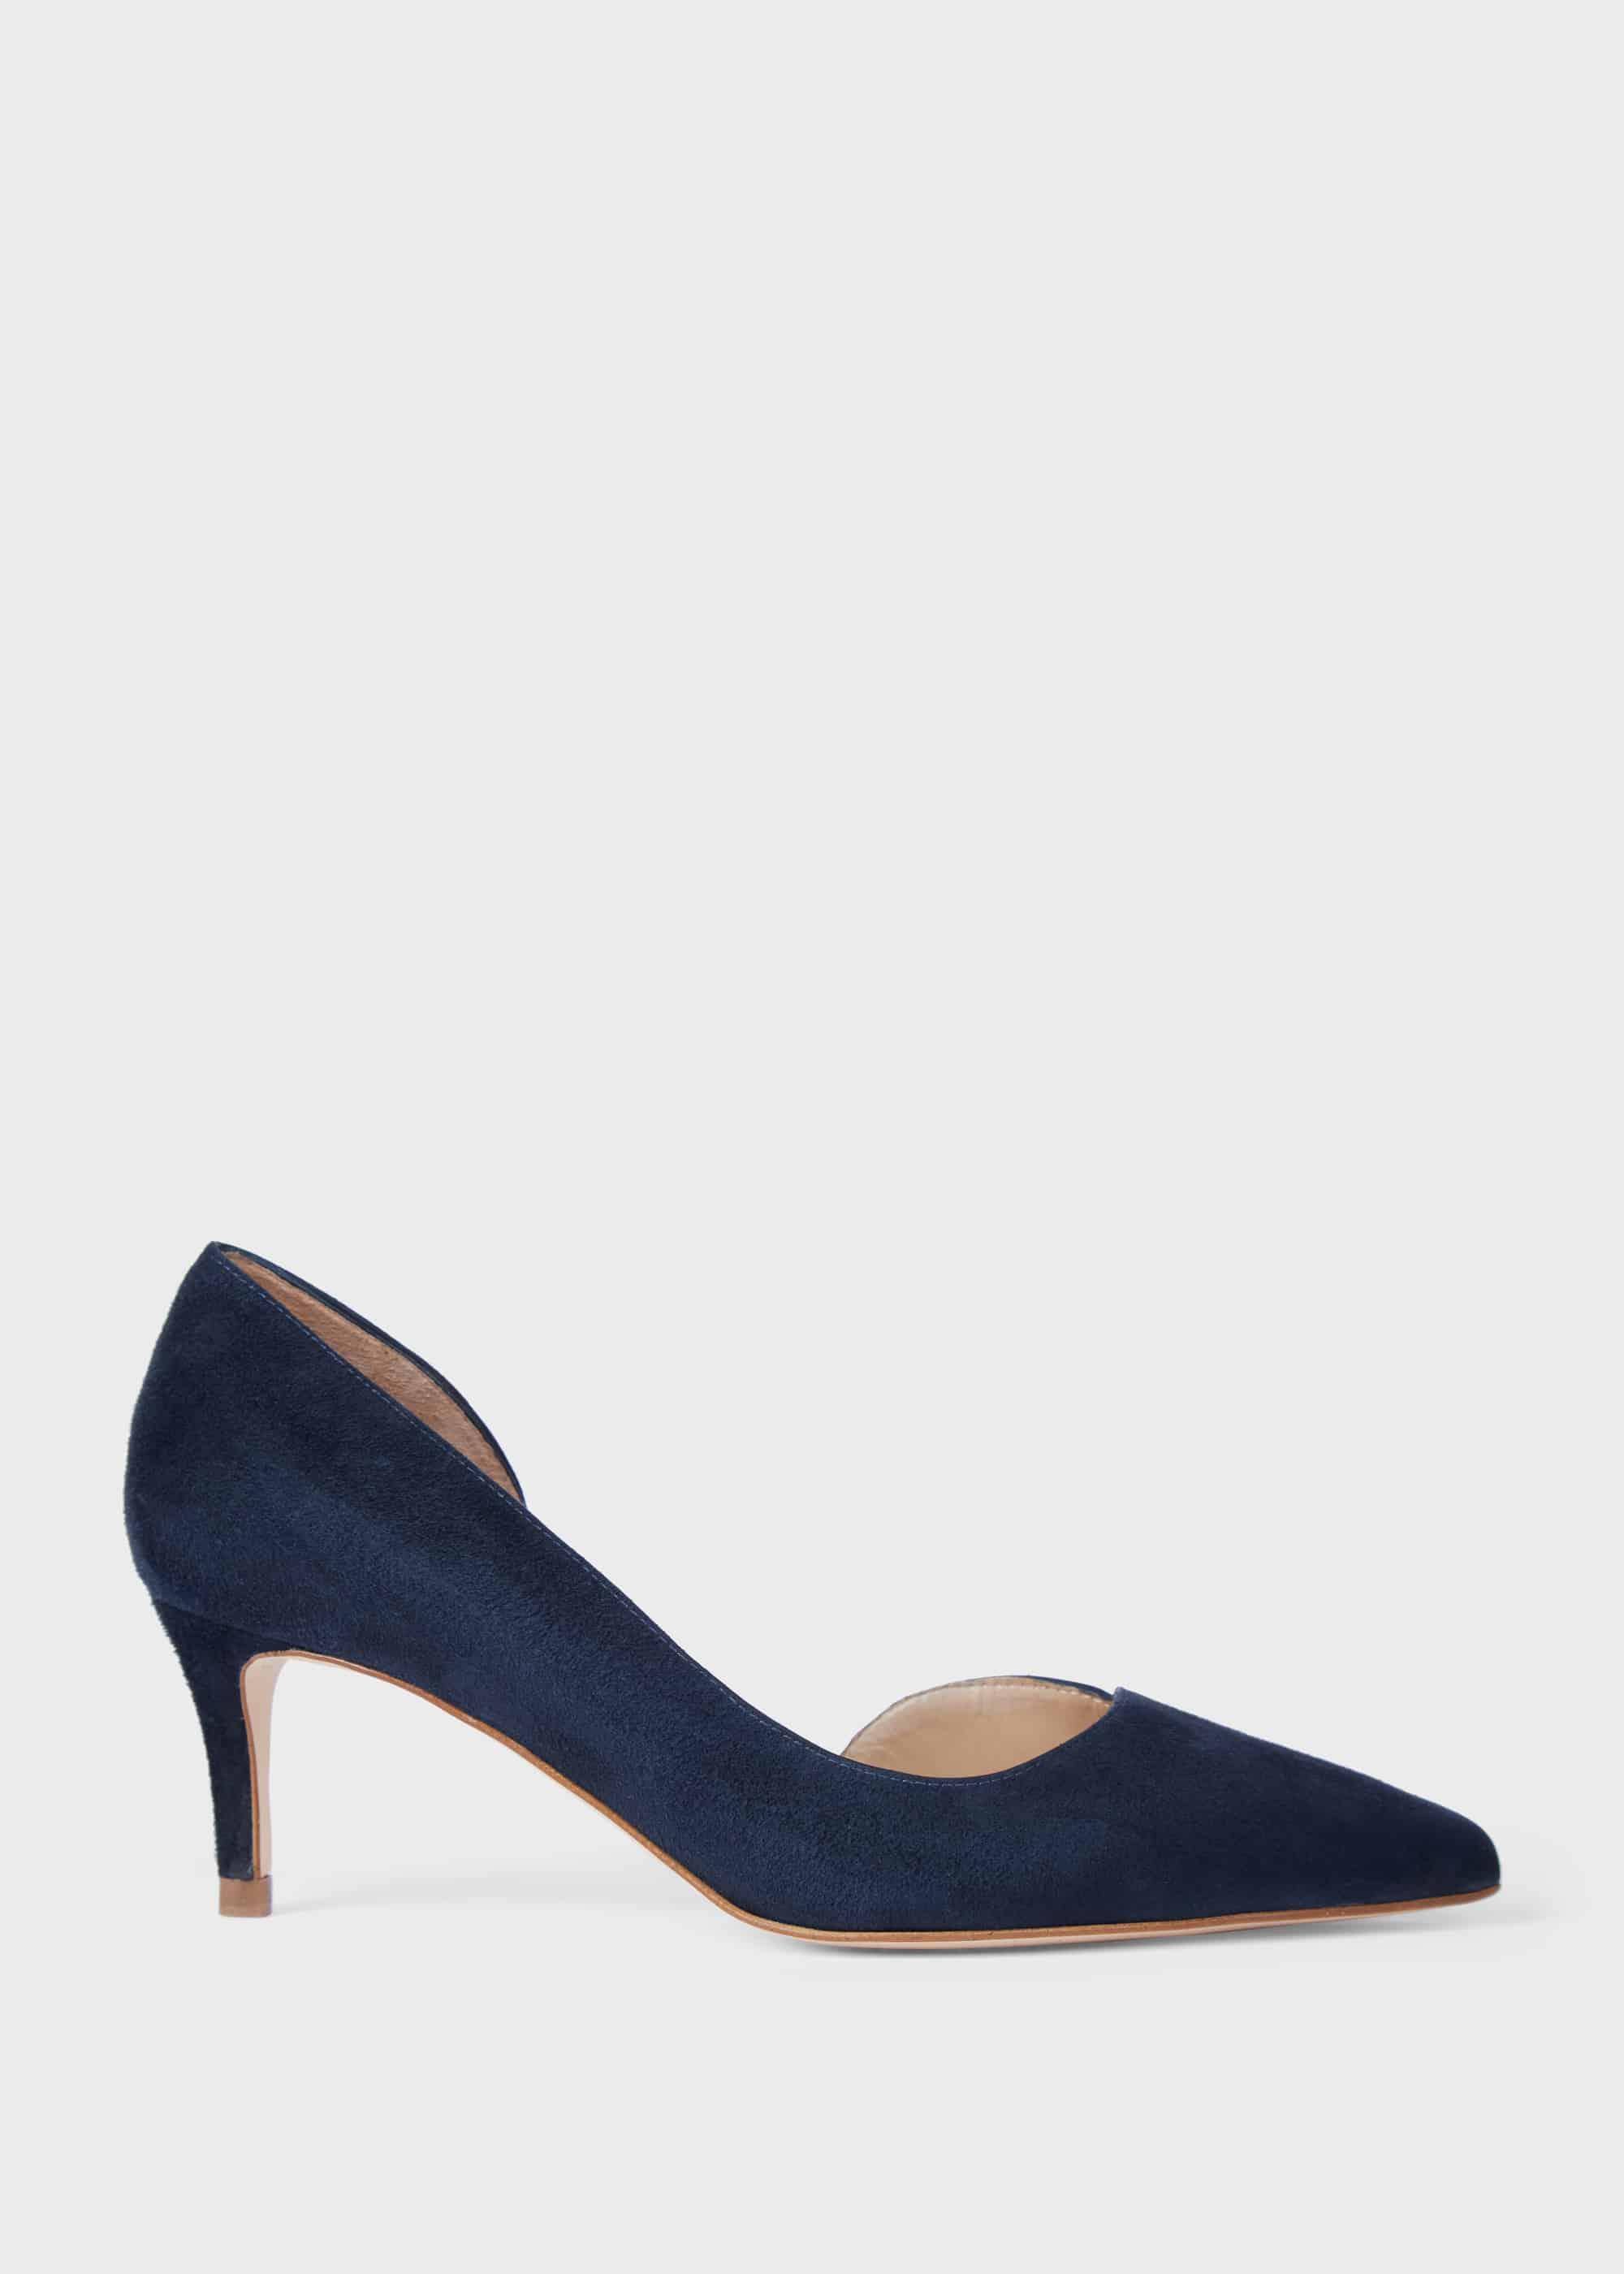 Hobbs Women Selena Suede D'Orsay Court Shoes